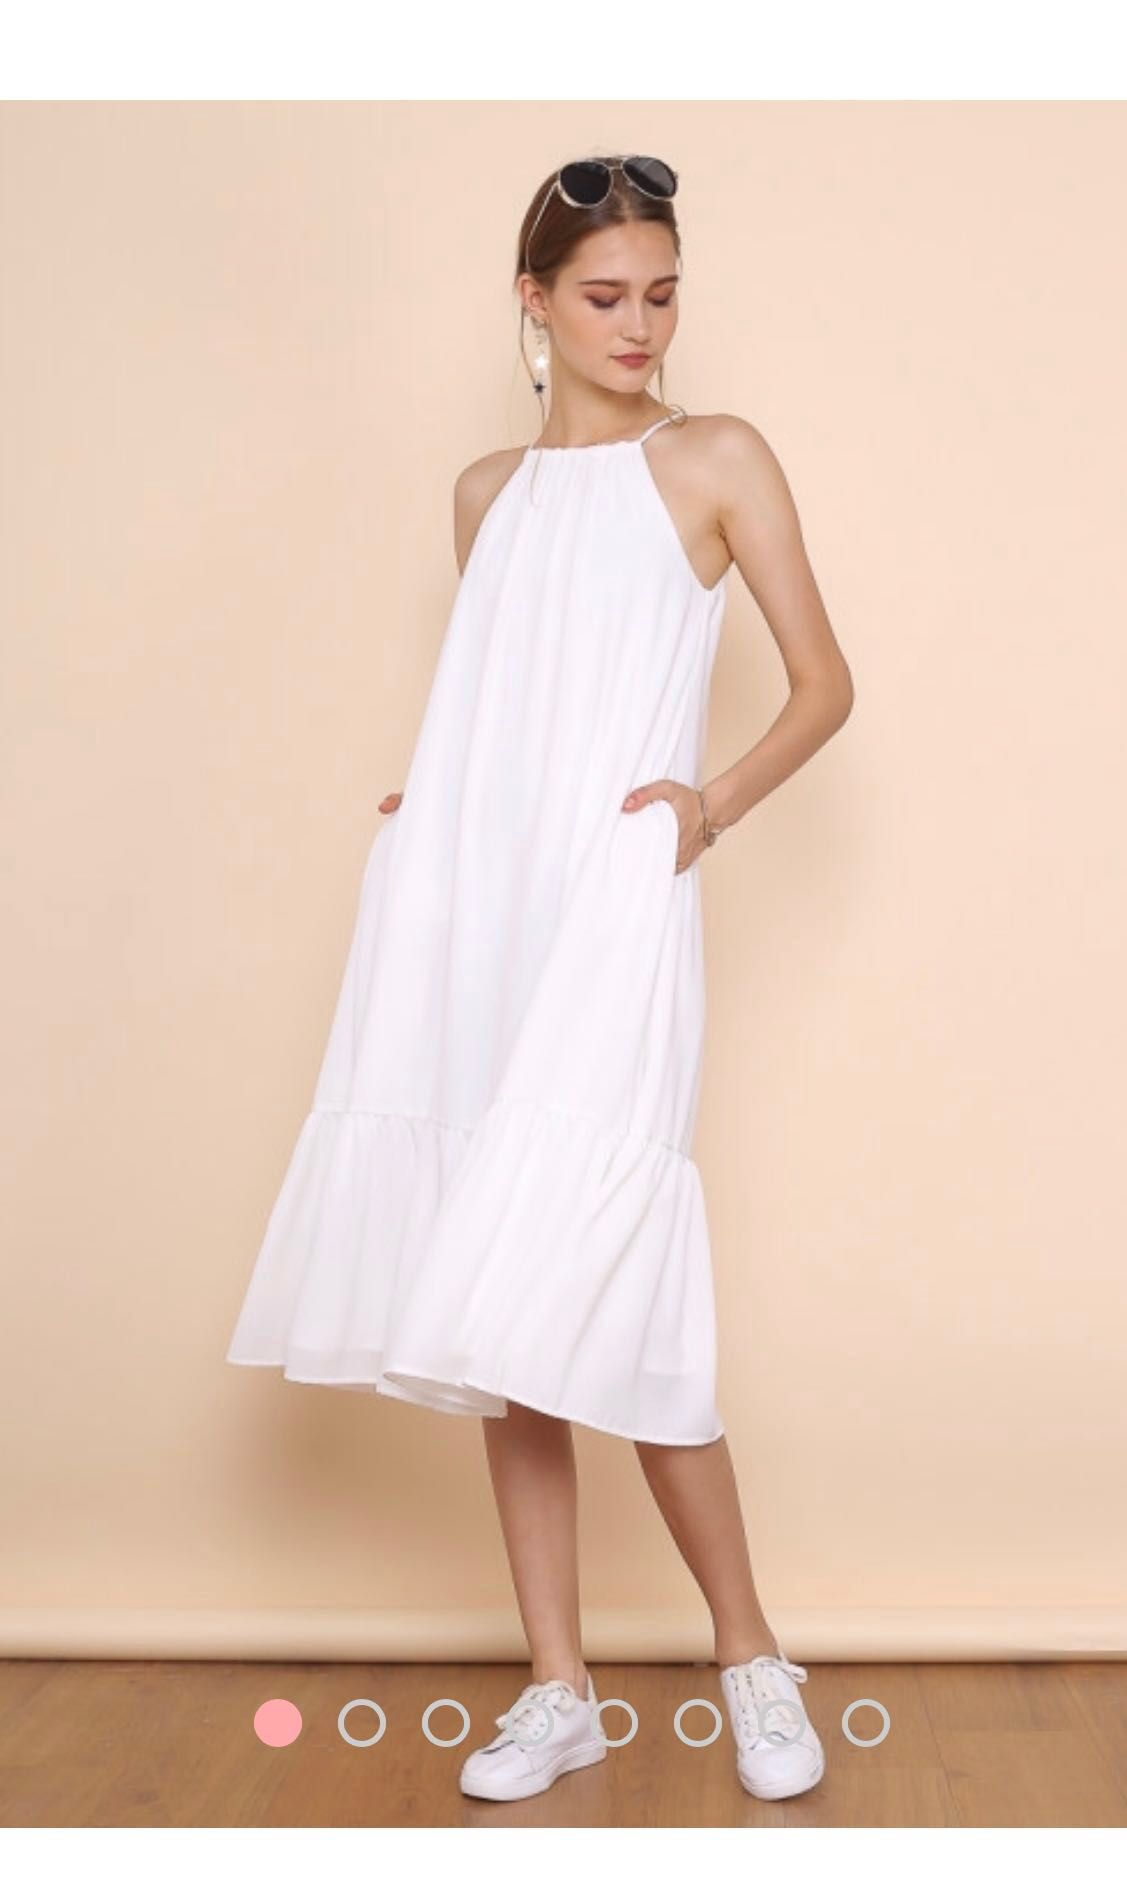 49dbcff12a3a Shop Supergurl Faith Halter Midi Dress (White) Size M